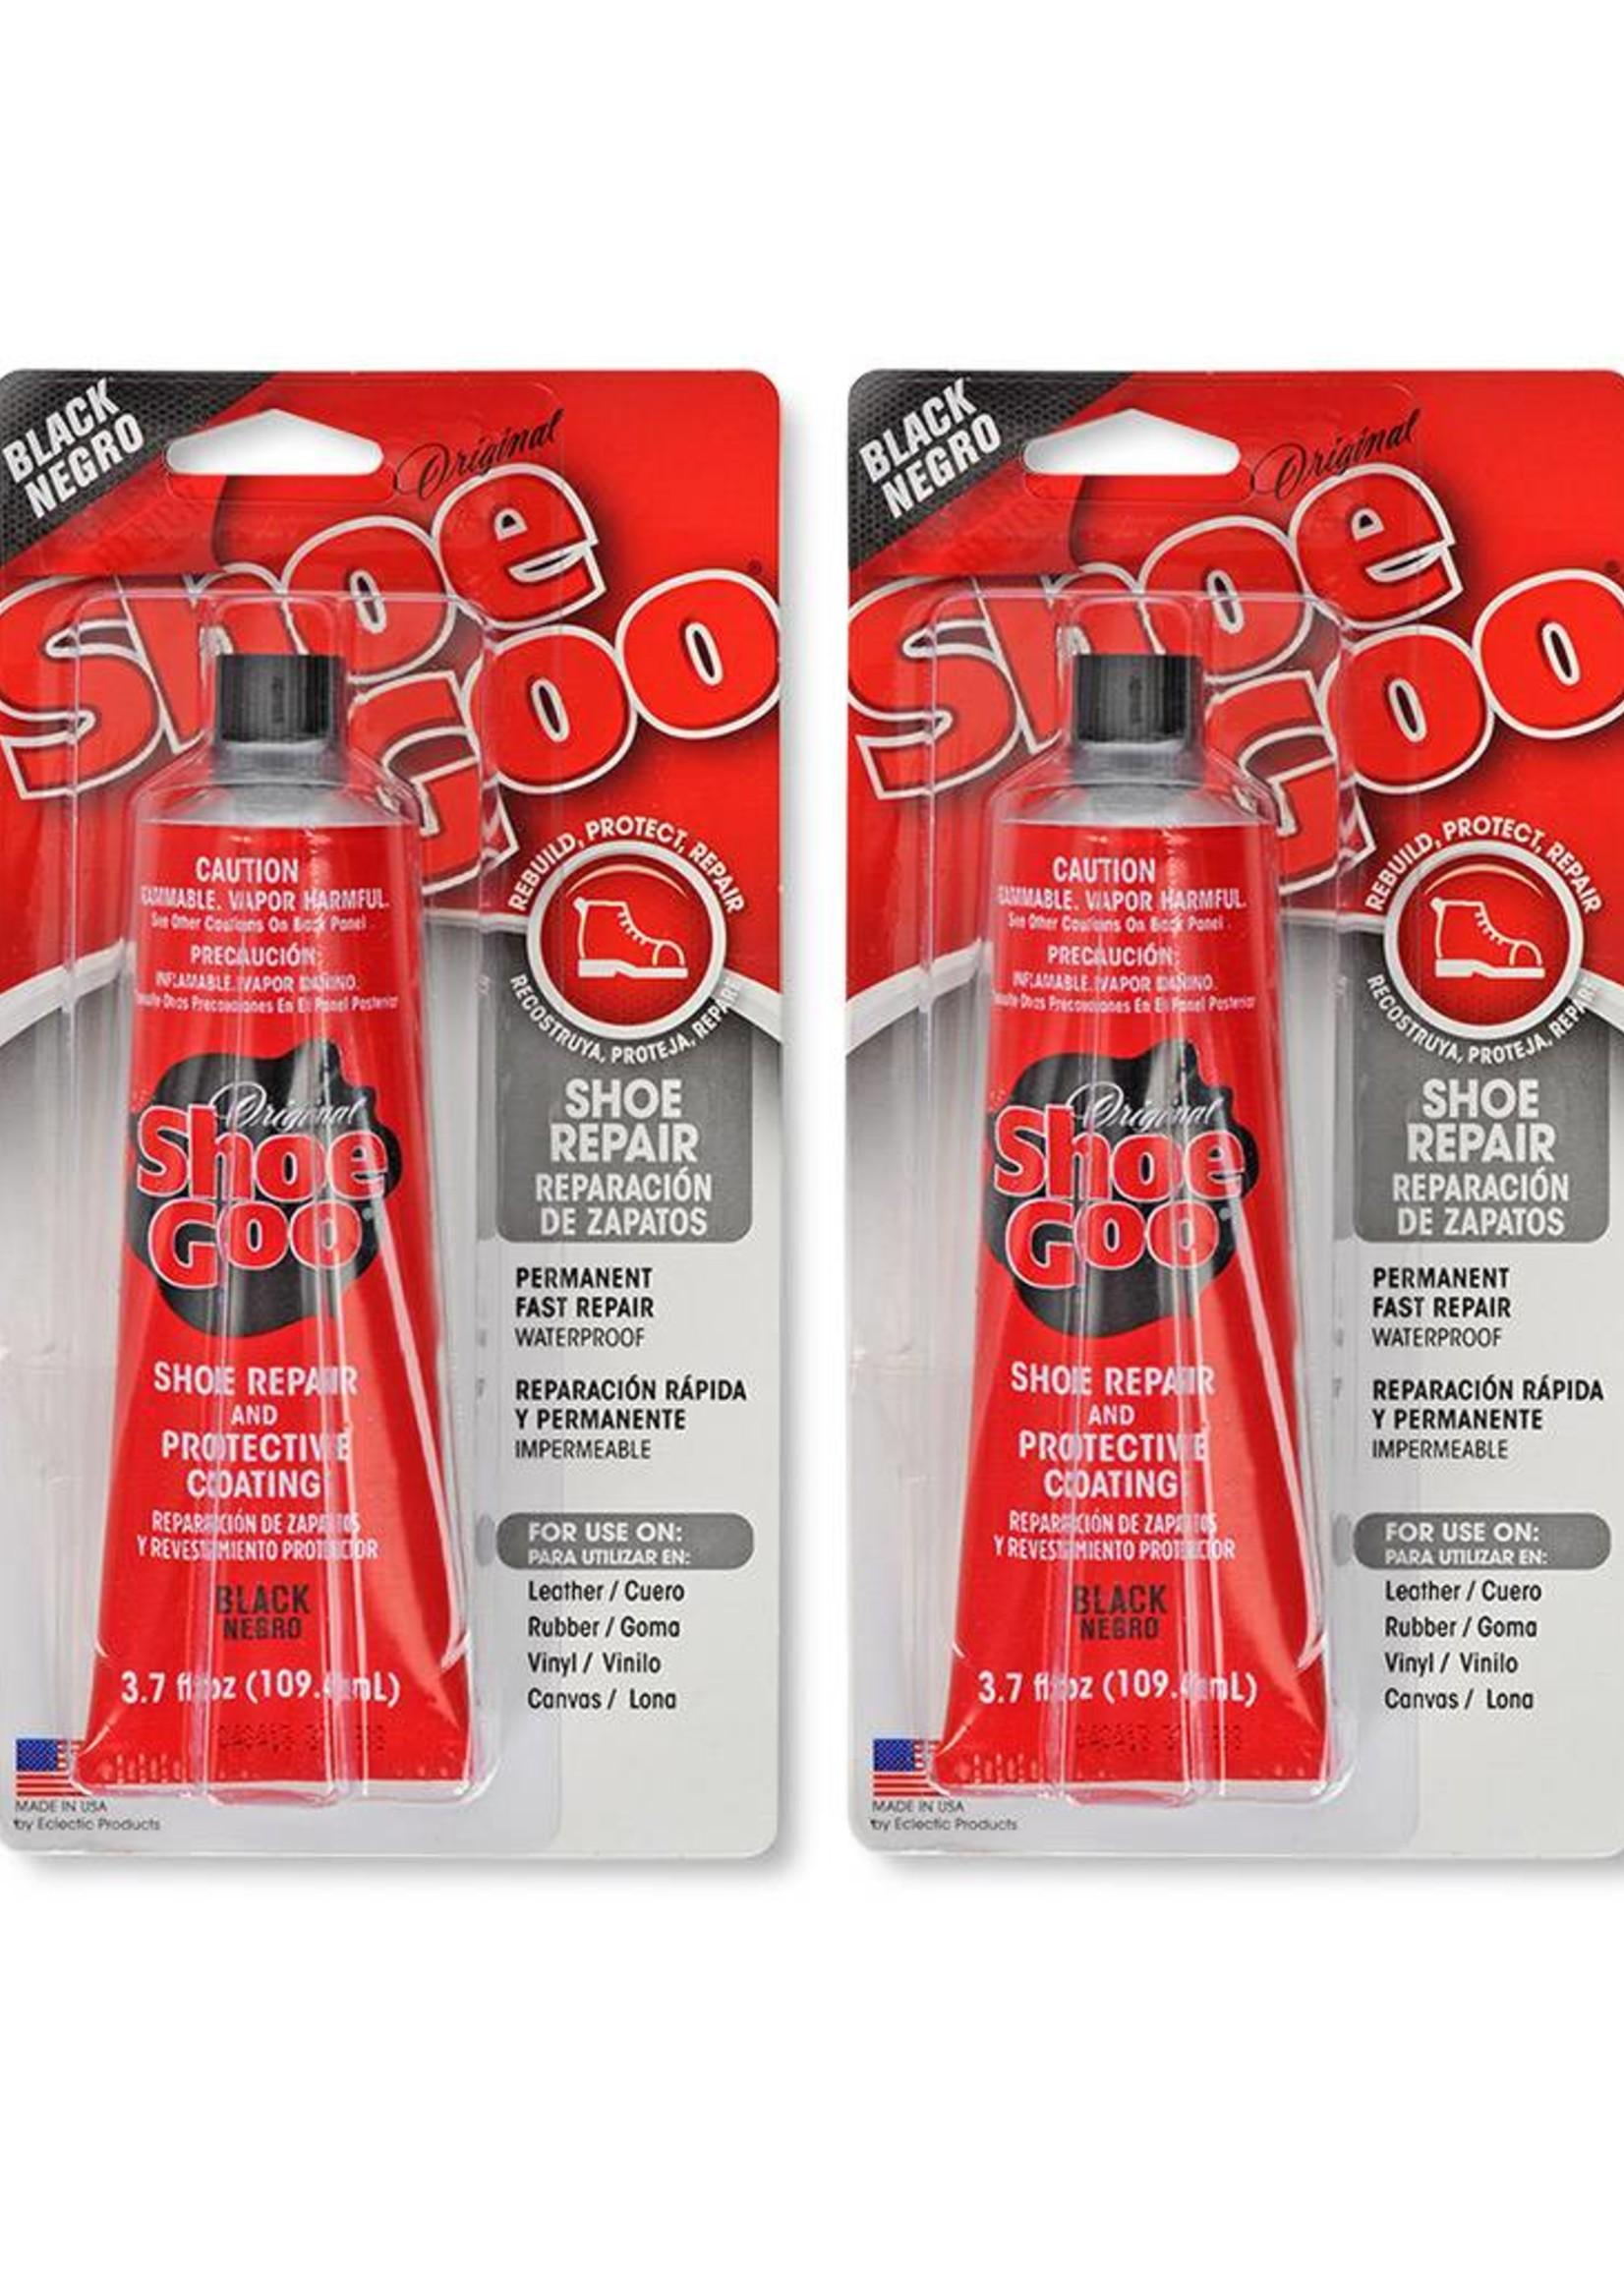 Shoe Goo Shoe Goo Original 110 ml Black 2-Pack with 10% Discount